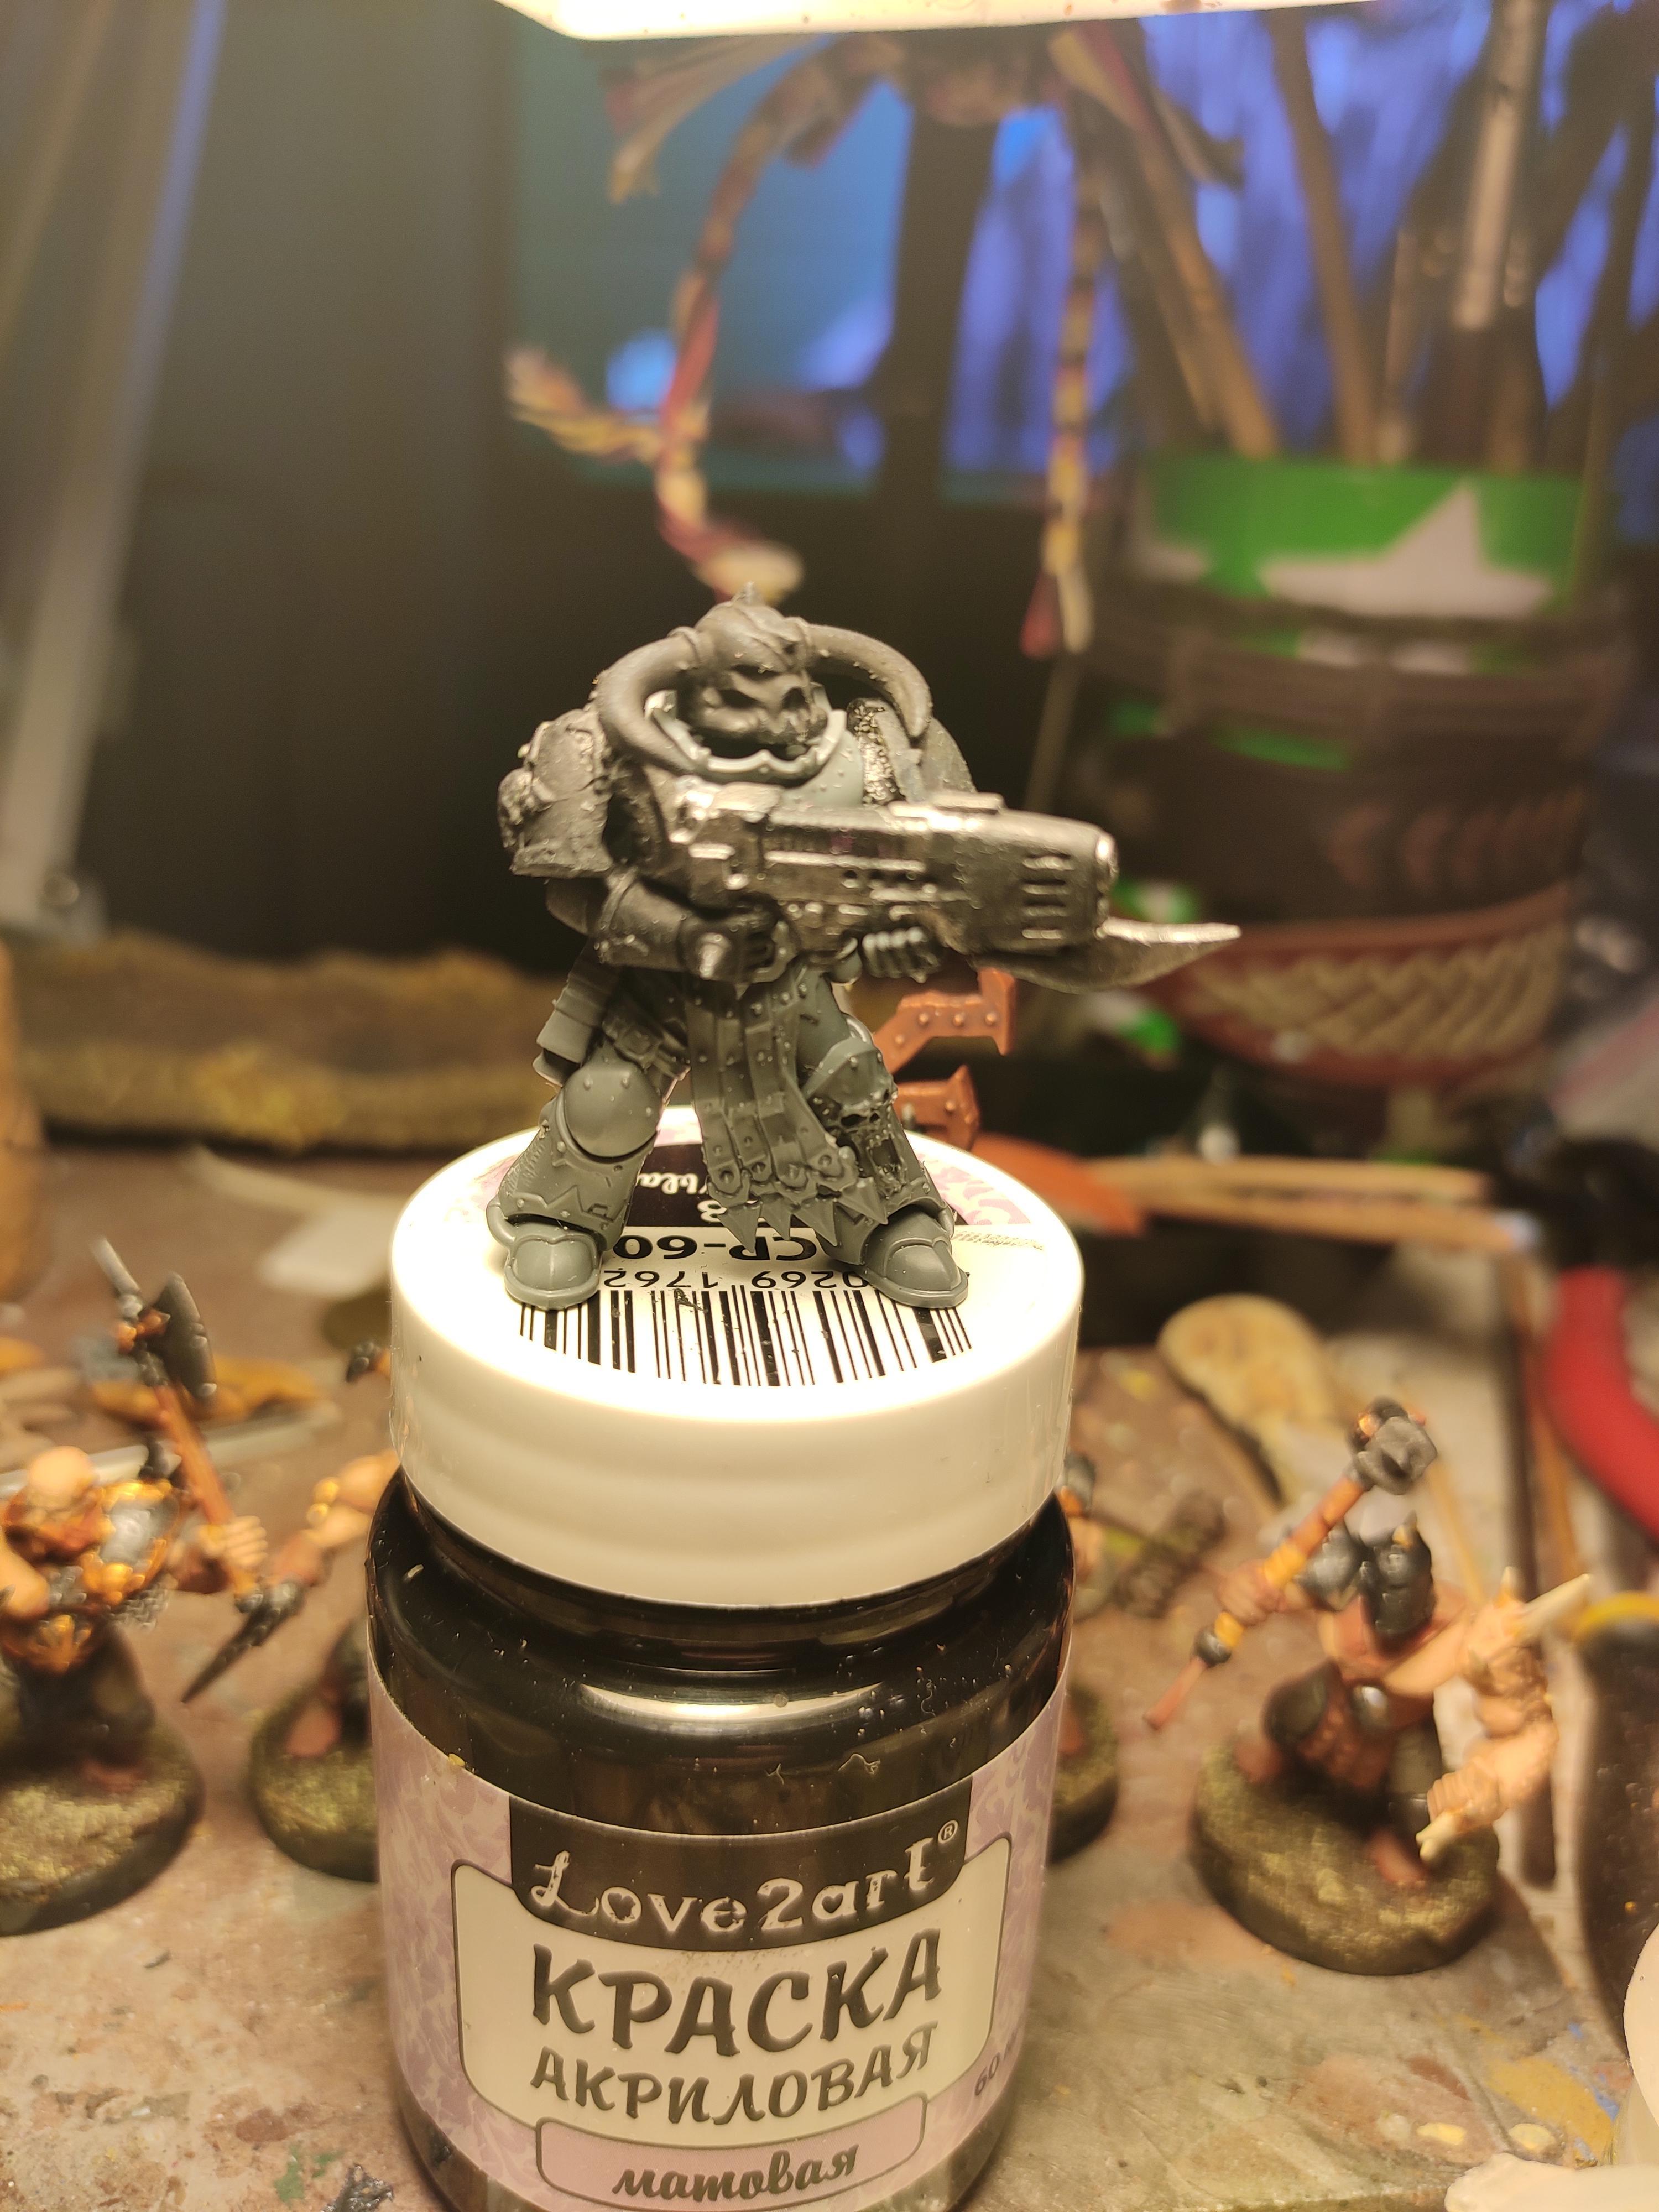 Bayonet, Blurred Photo, Chaos, Chaos Space Marines, Conversion, Heretic Astartes, Kitbash, Plasma, Regiment, Shadowspear, Traitor Legions, Warhammer 40,000, Work In Progress